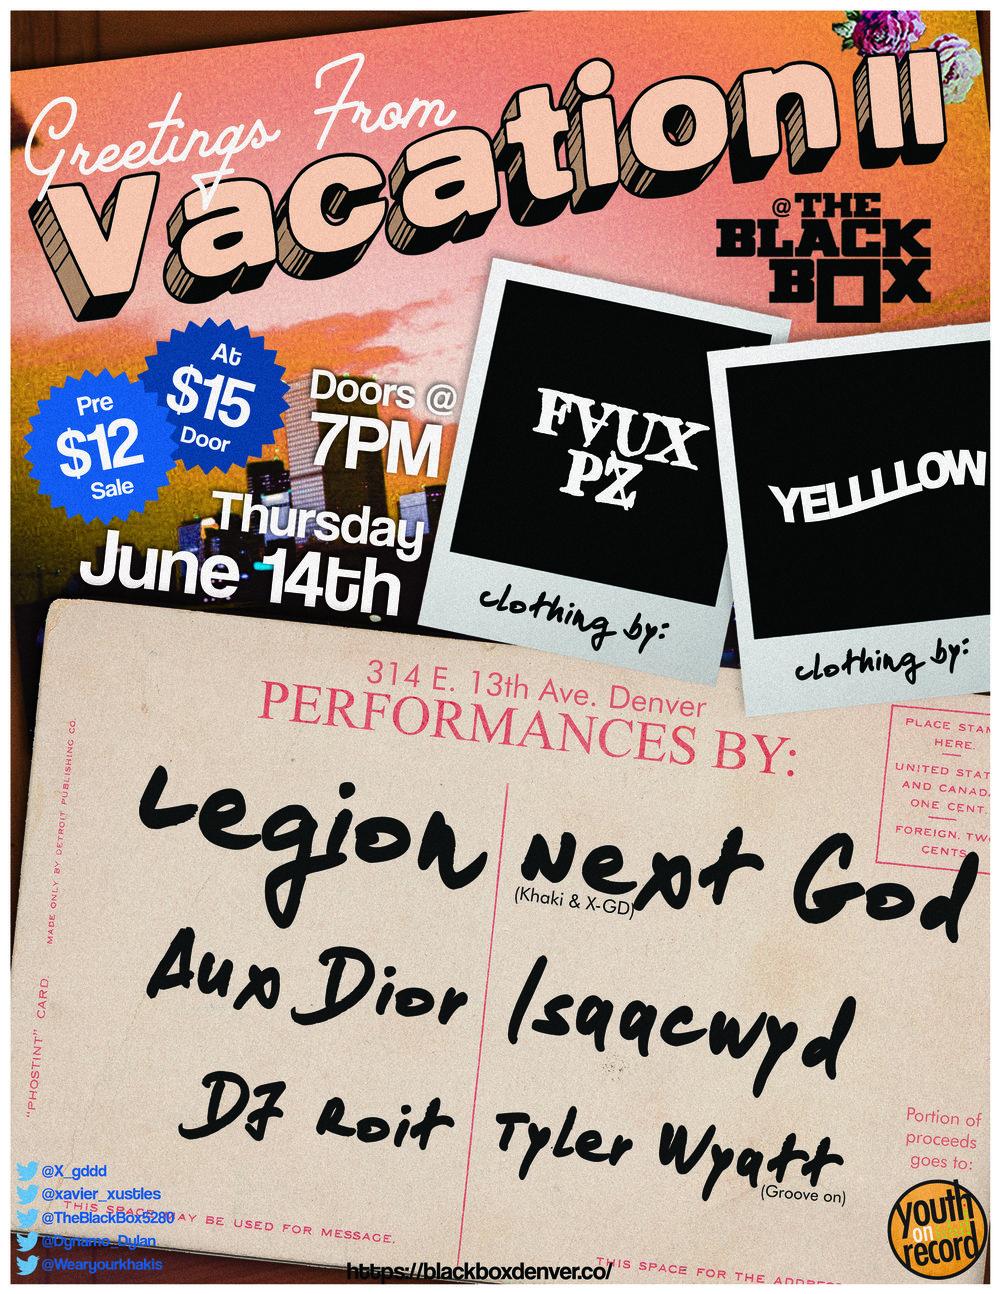 Vacation 2 Poster Flat.jpg